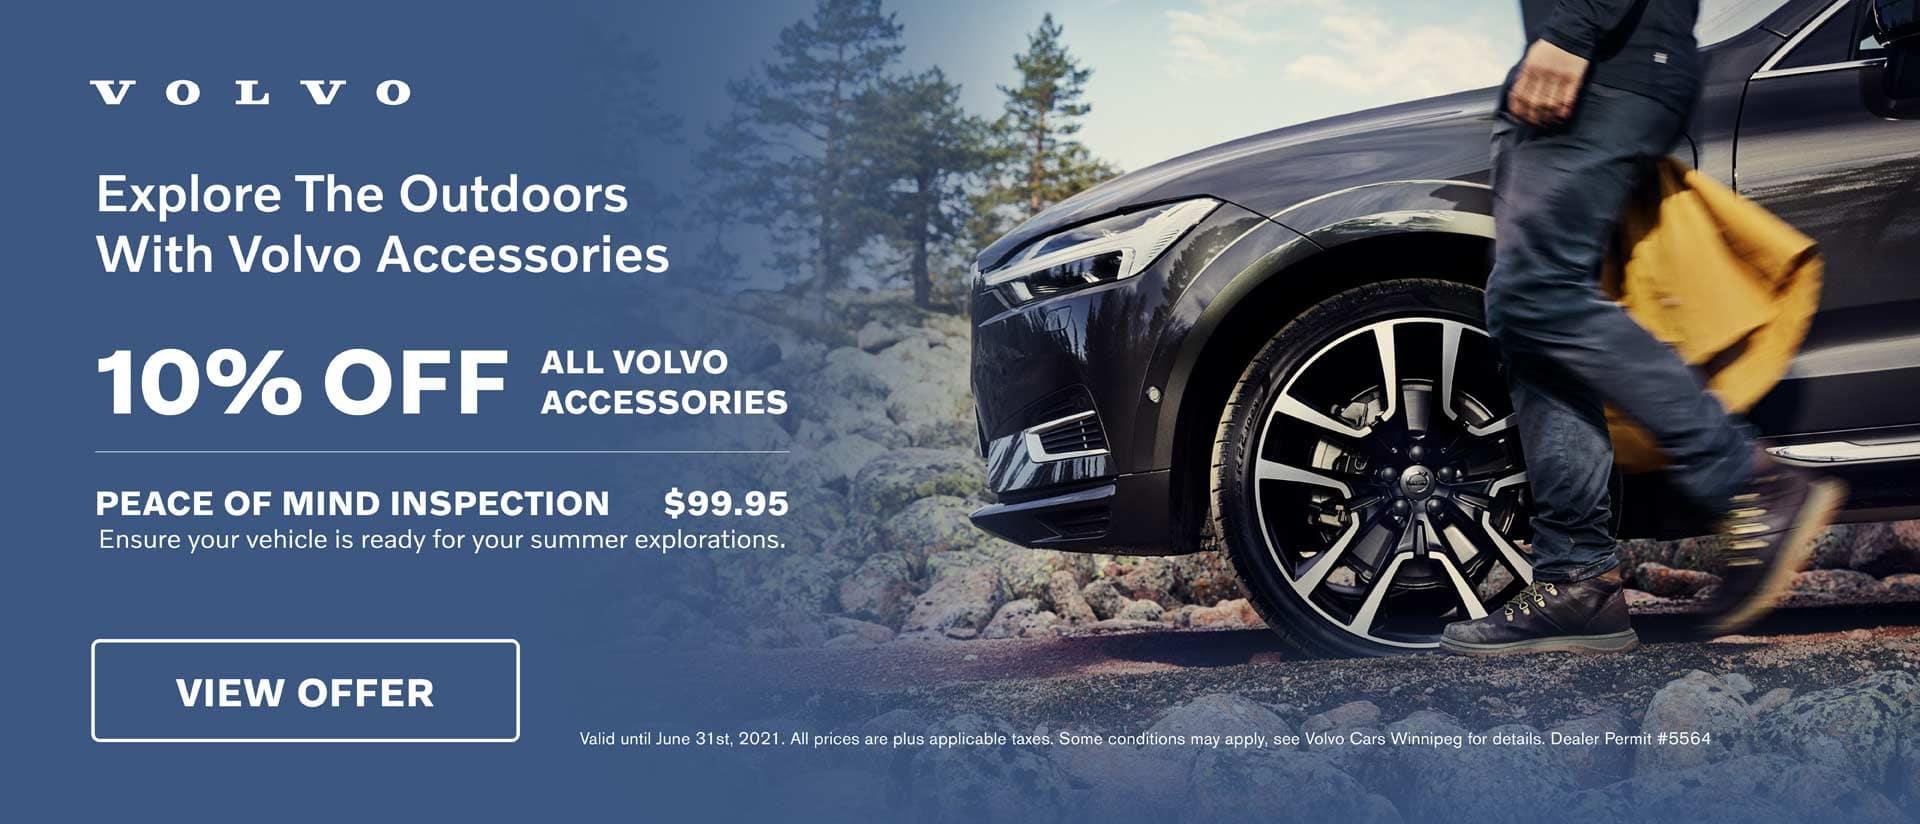 Volvo Cars Winnipeg V60 May Offer